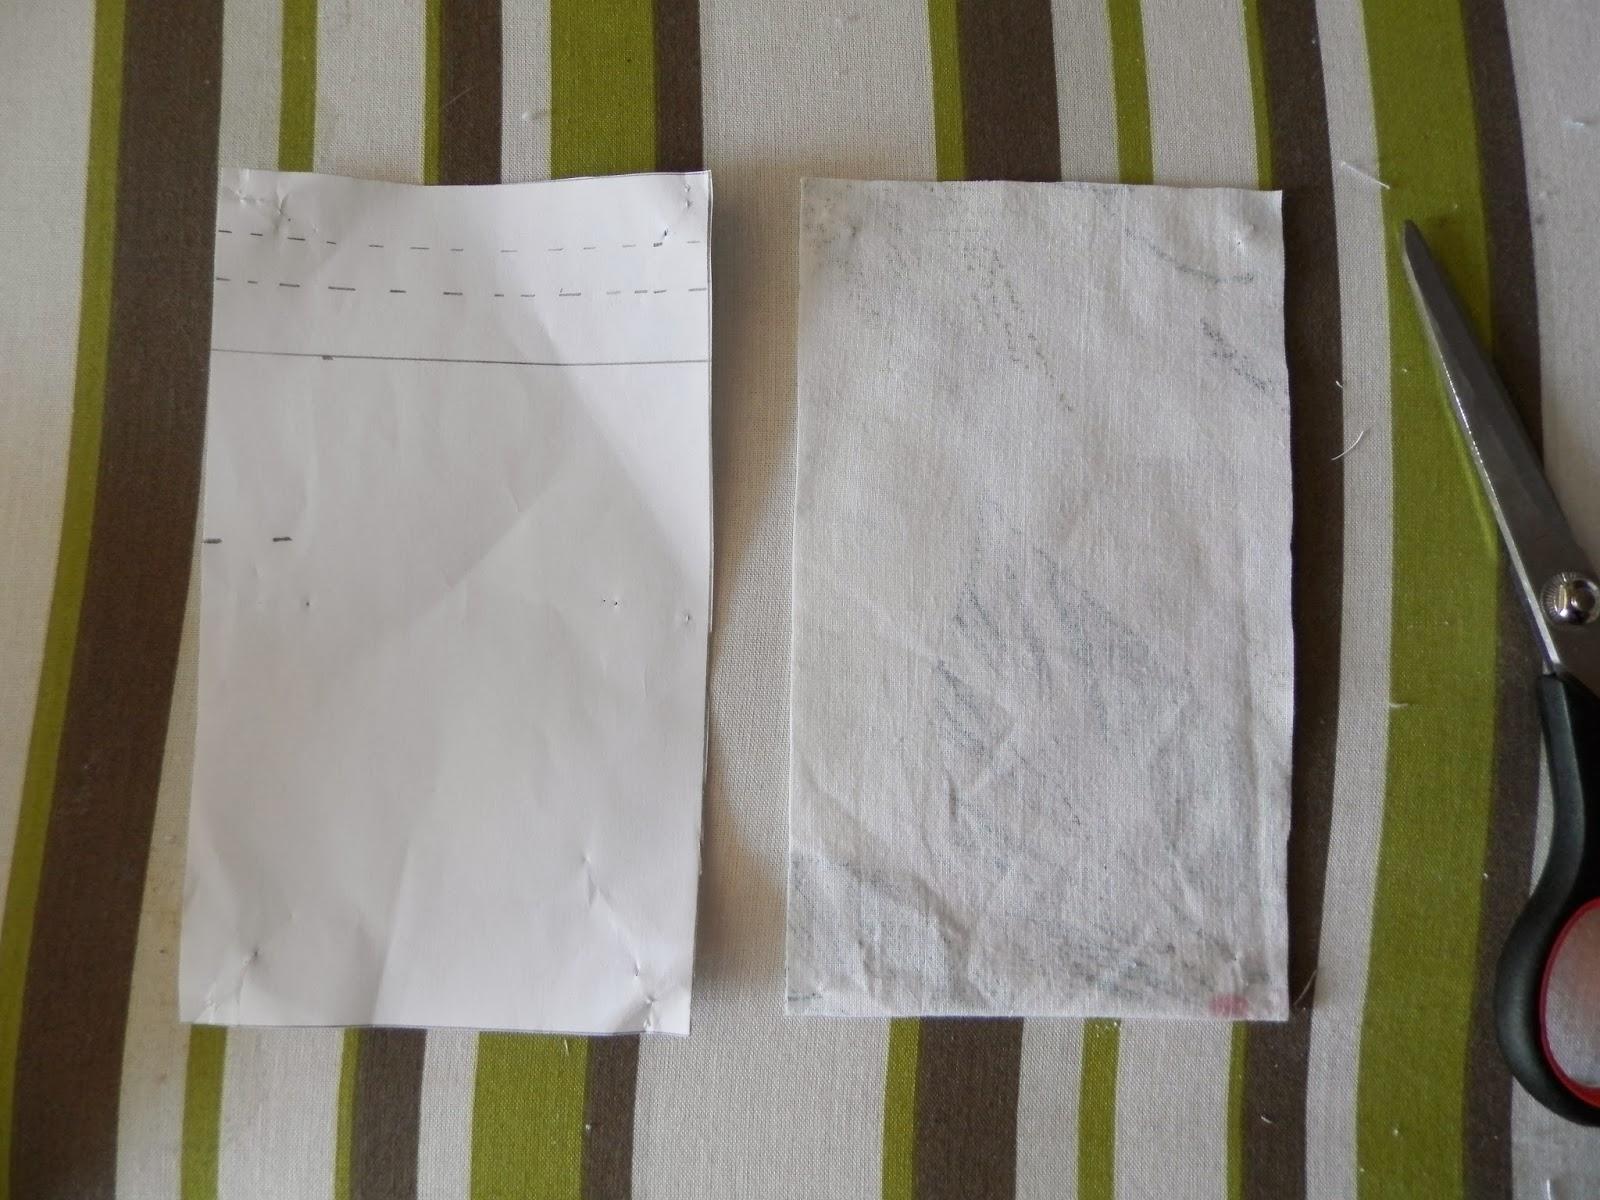 Coton et Création : tuto pochon en tissu